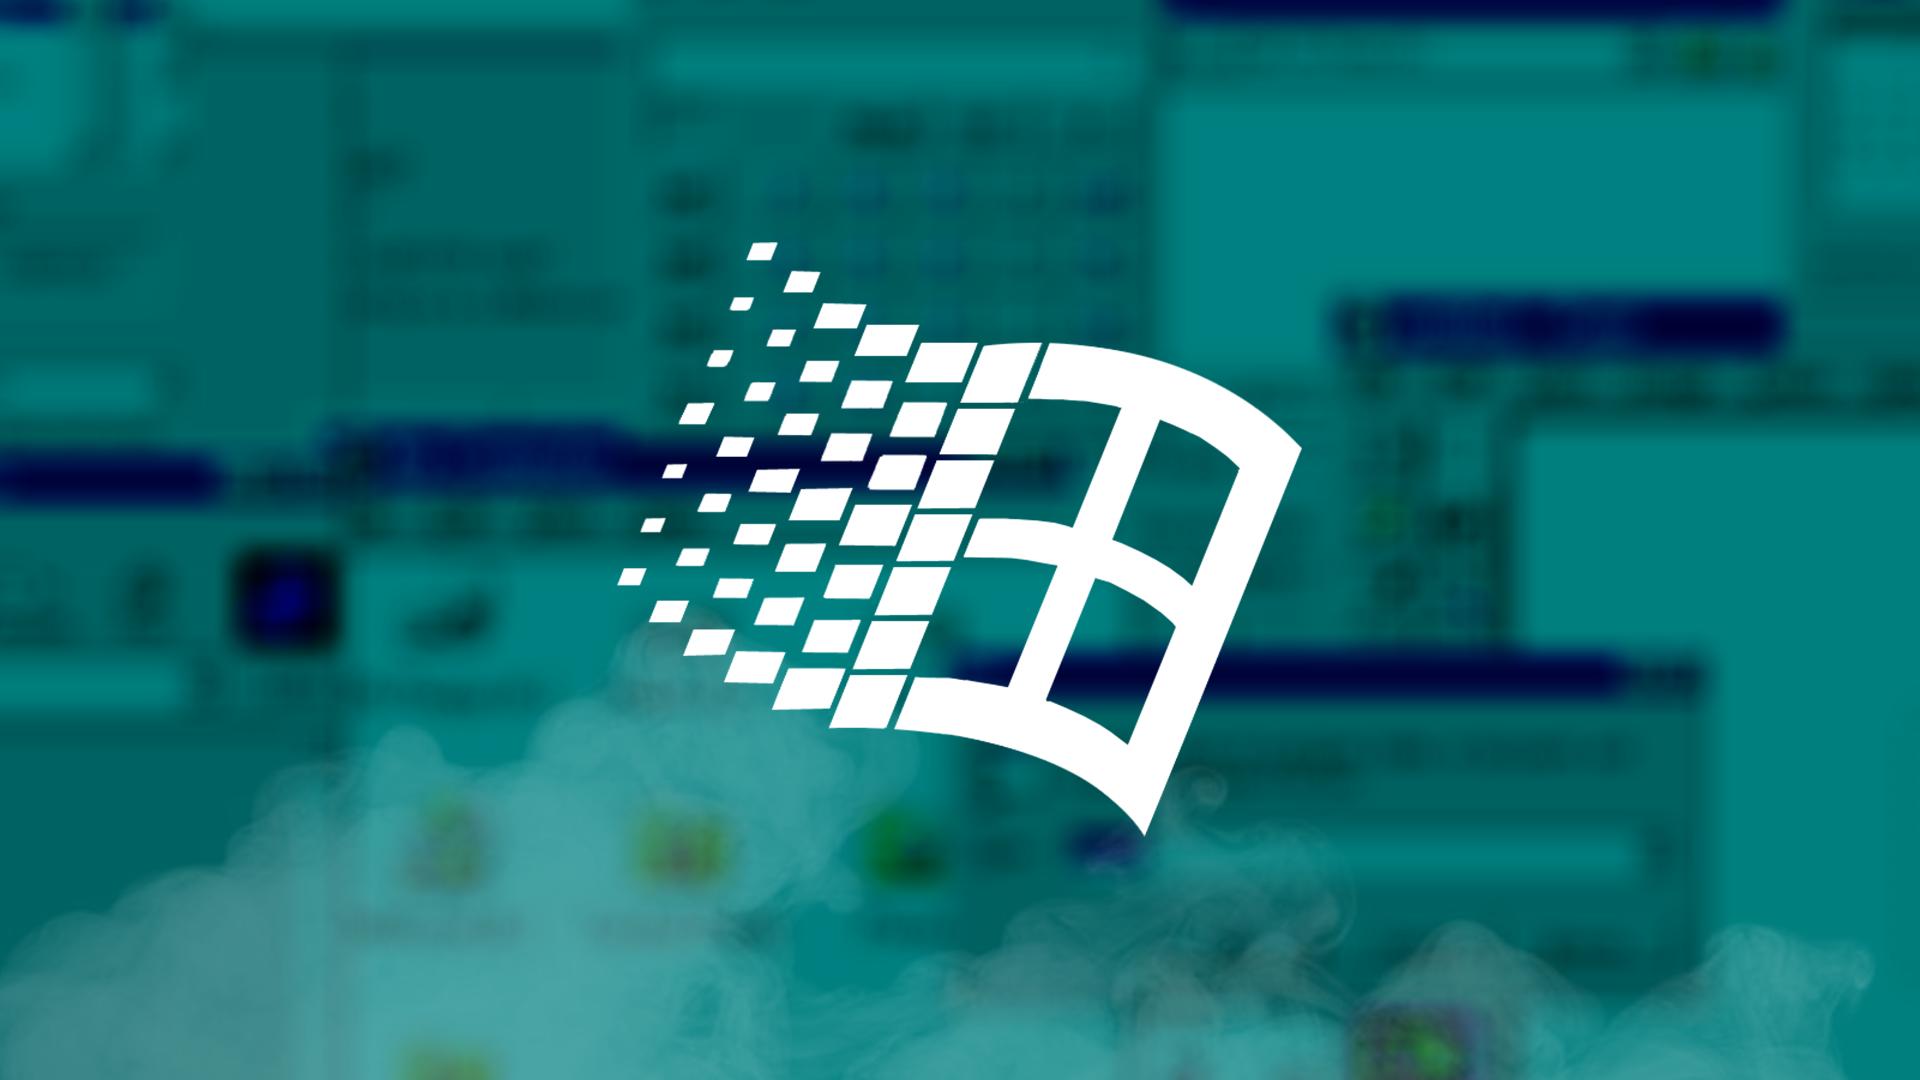 Windows 95 321274 Hd Wallpaper Backgrounds Download